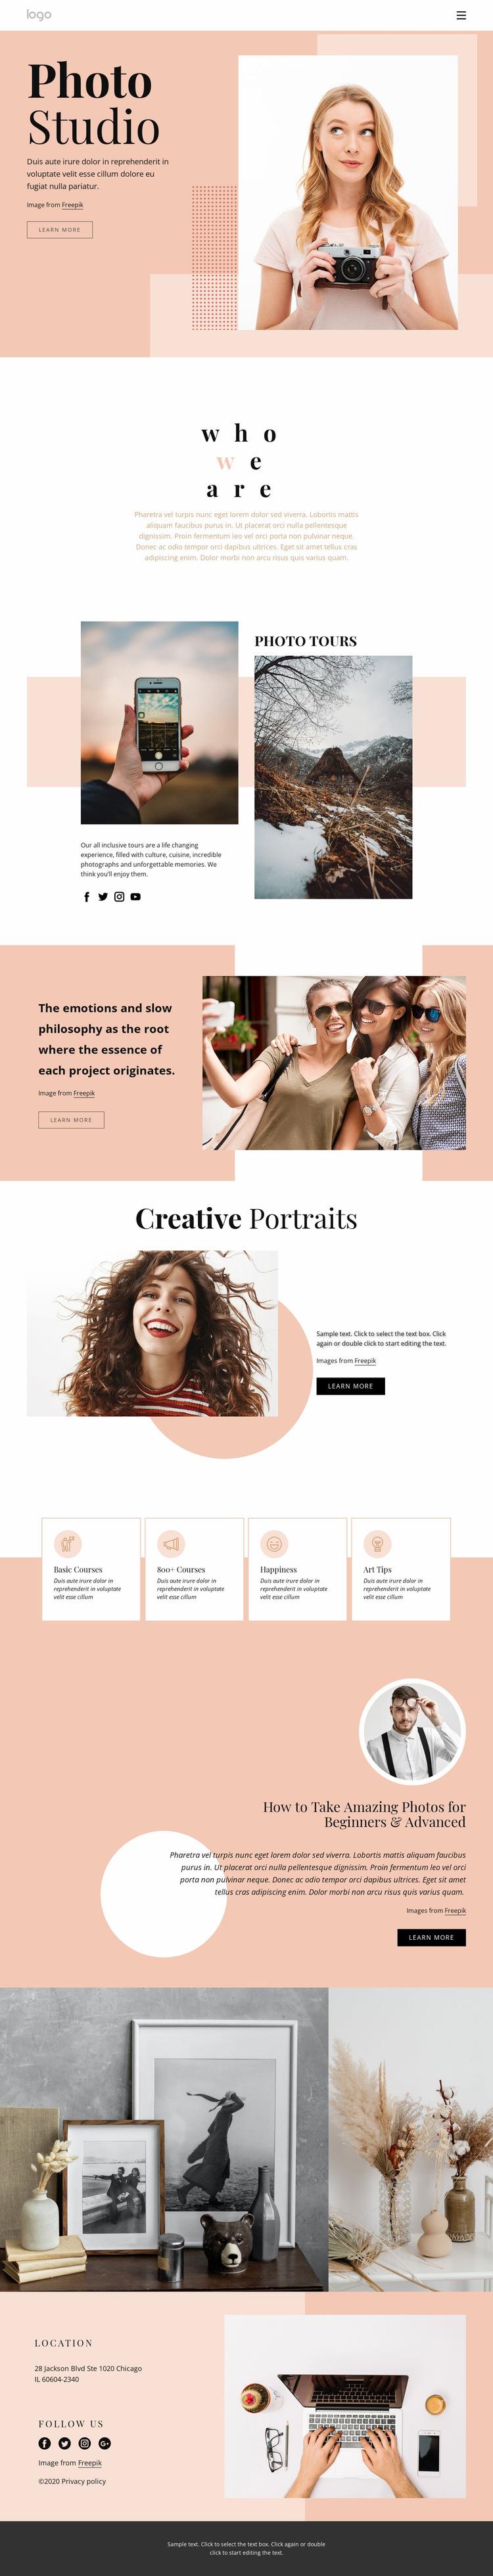 Photography courses Website Builder Templates